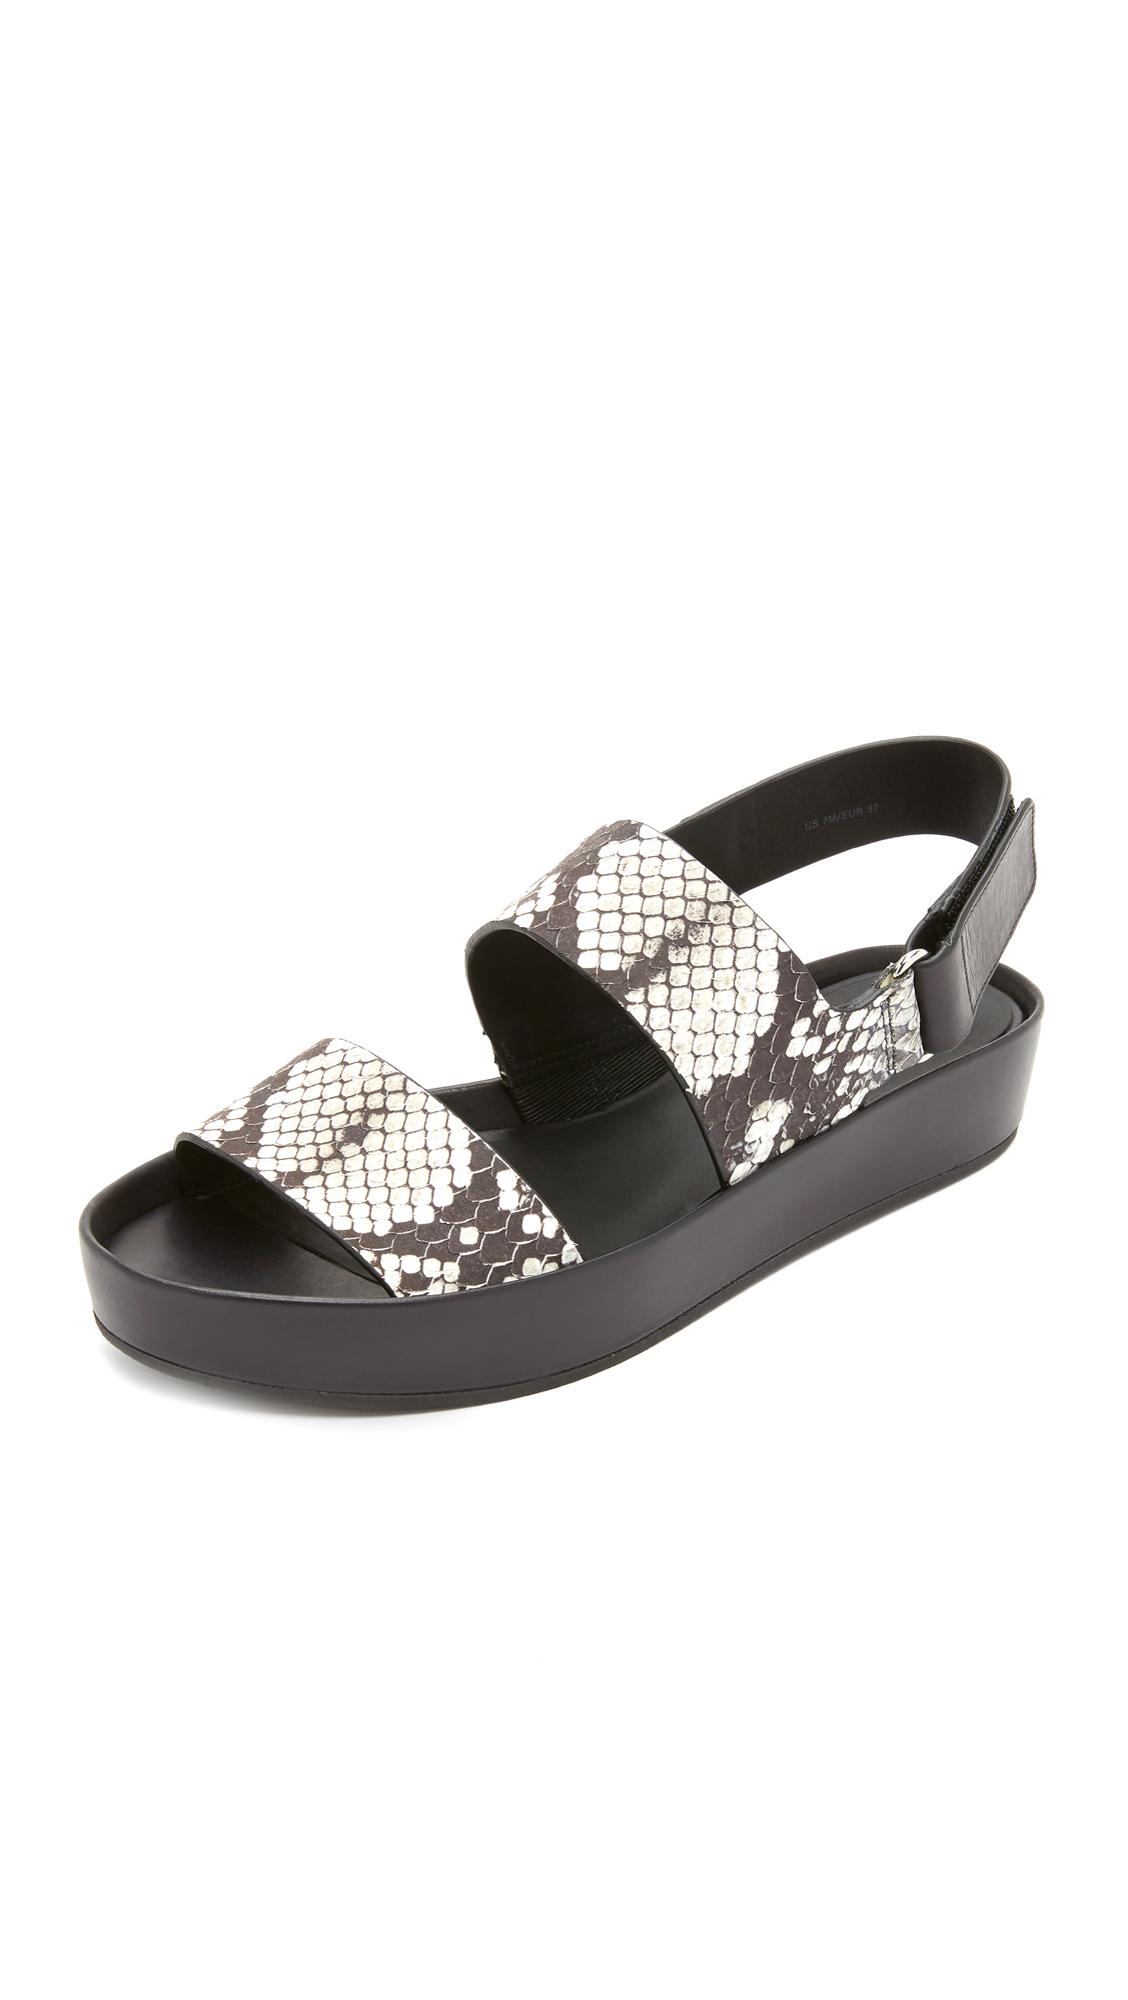 83f20232d5a7 Lyst - Vince Marett Flatform Sandals in Black